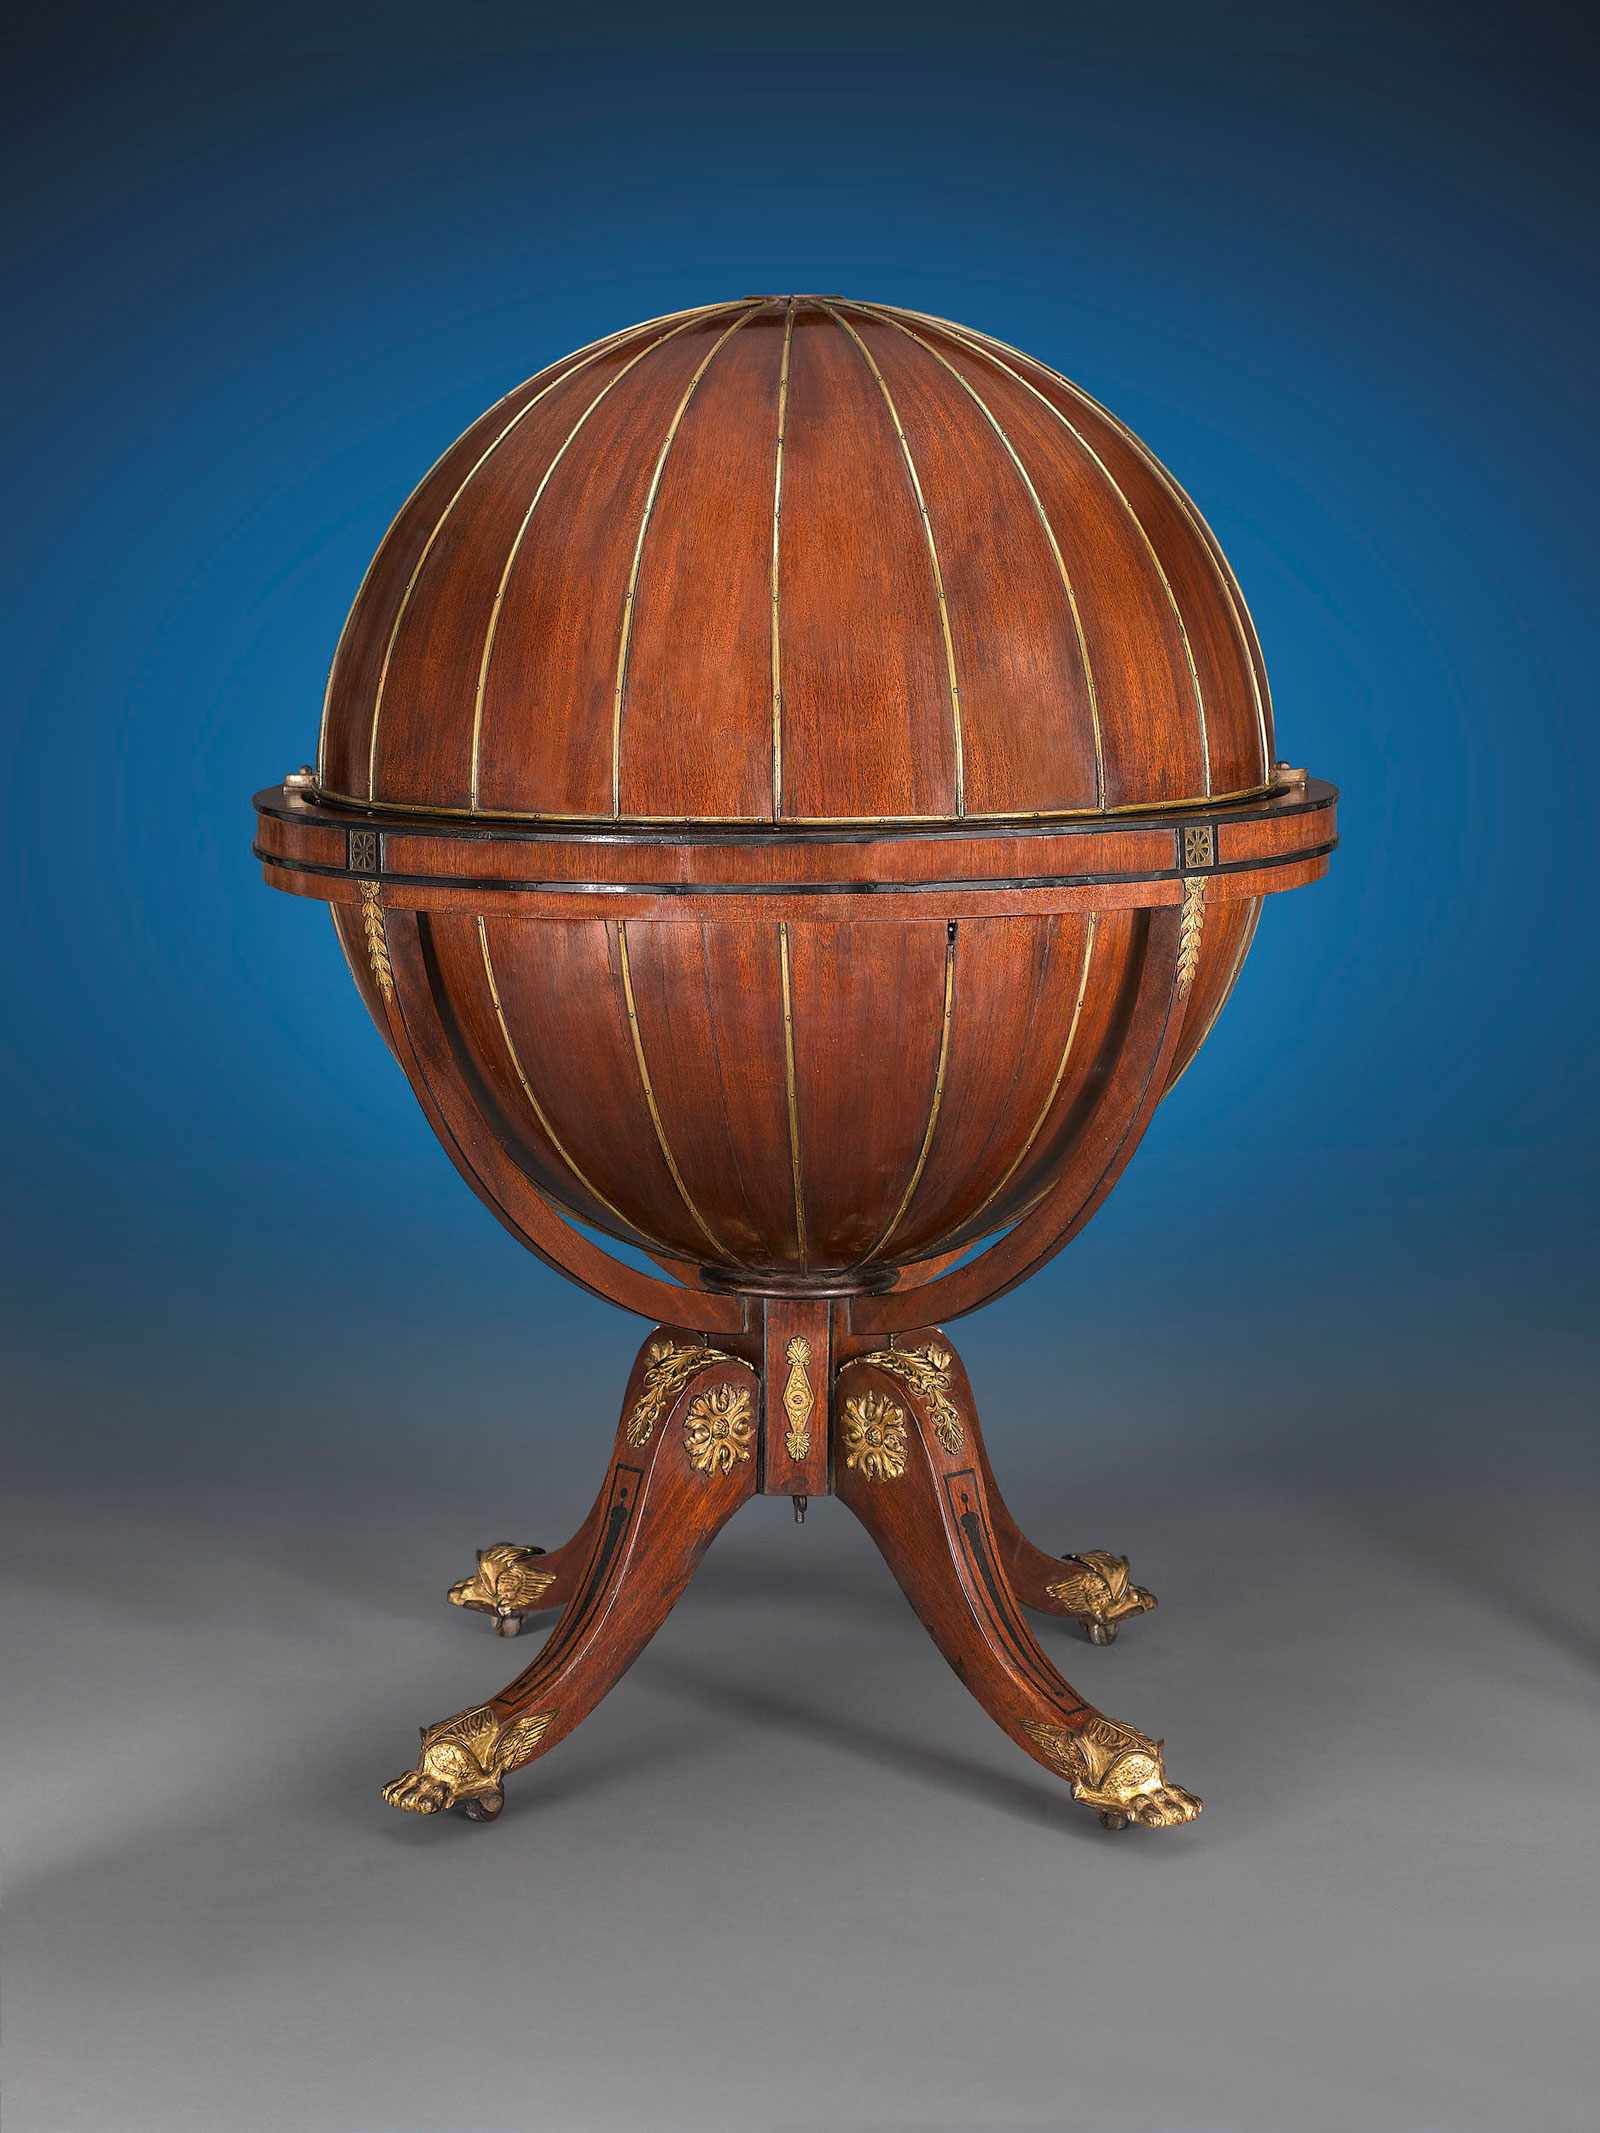 M S Rau Antiques Offers 1810 English Globe Writing Desk